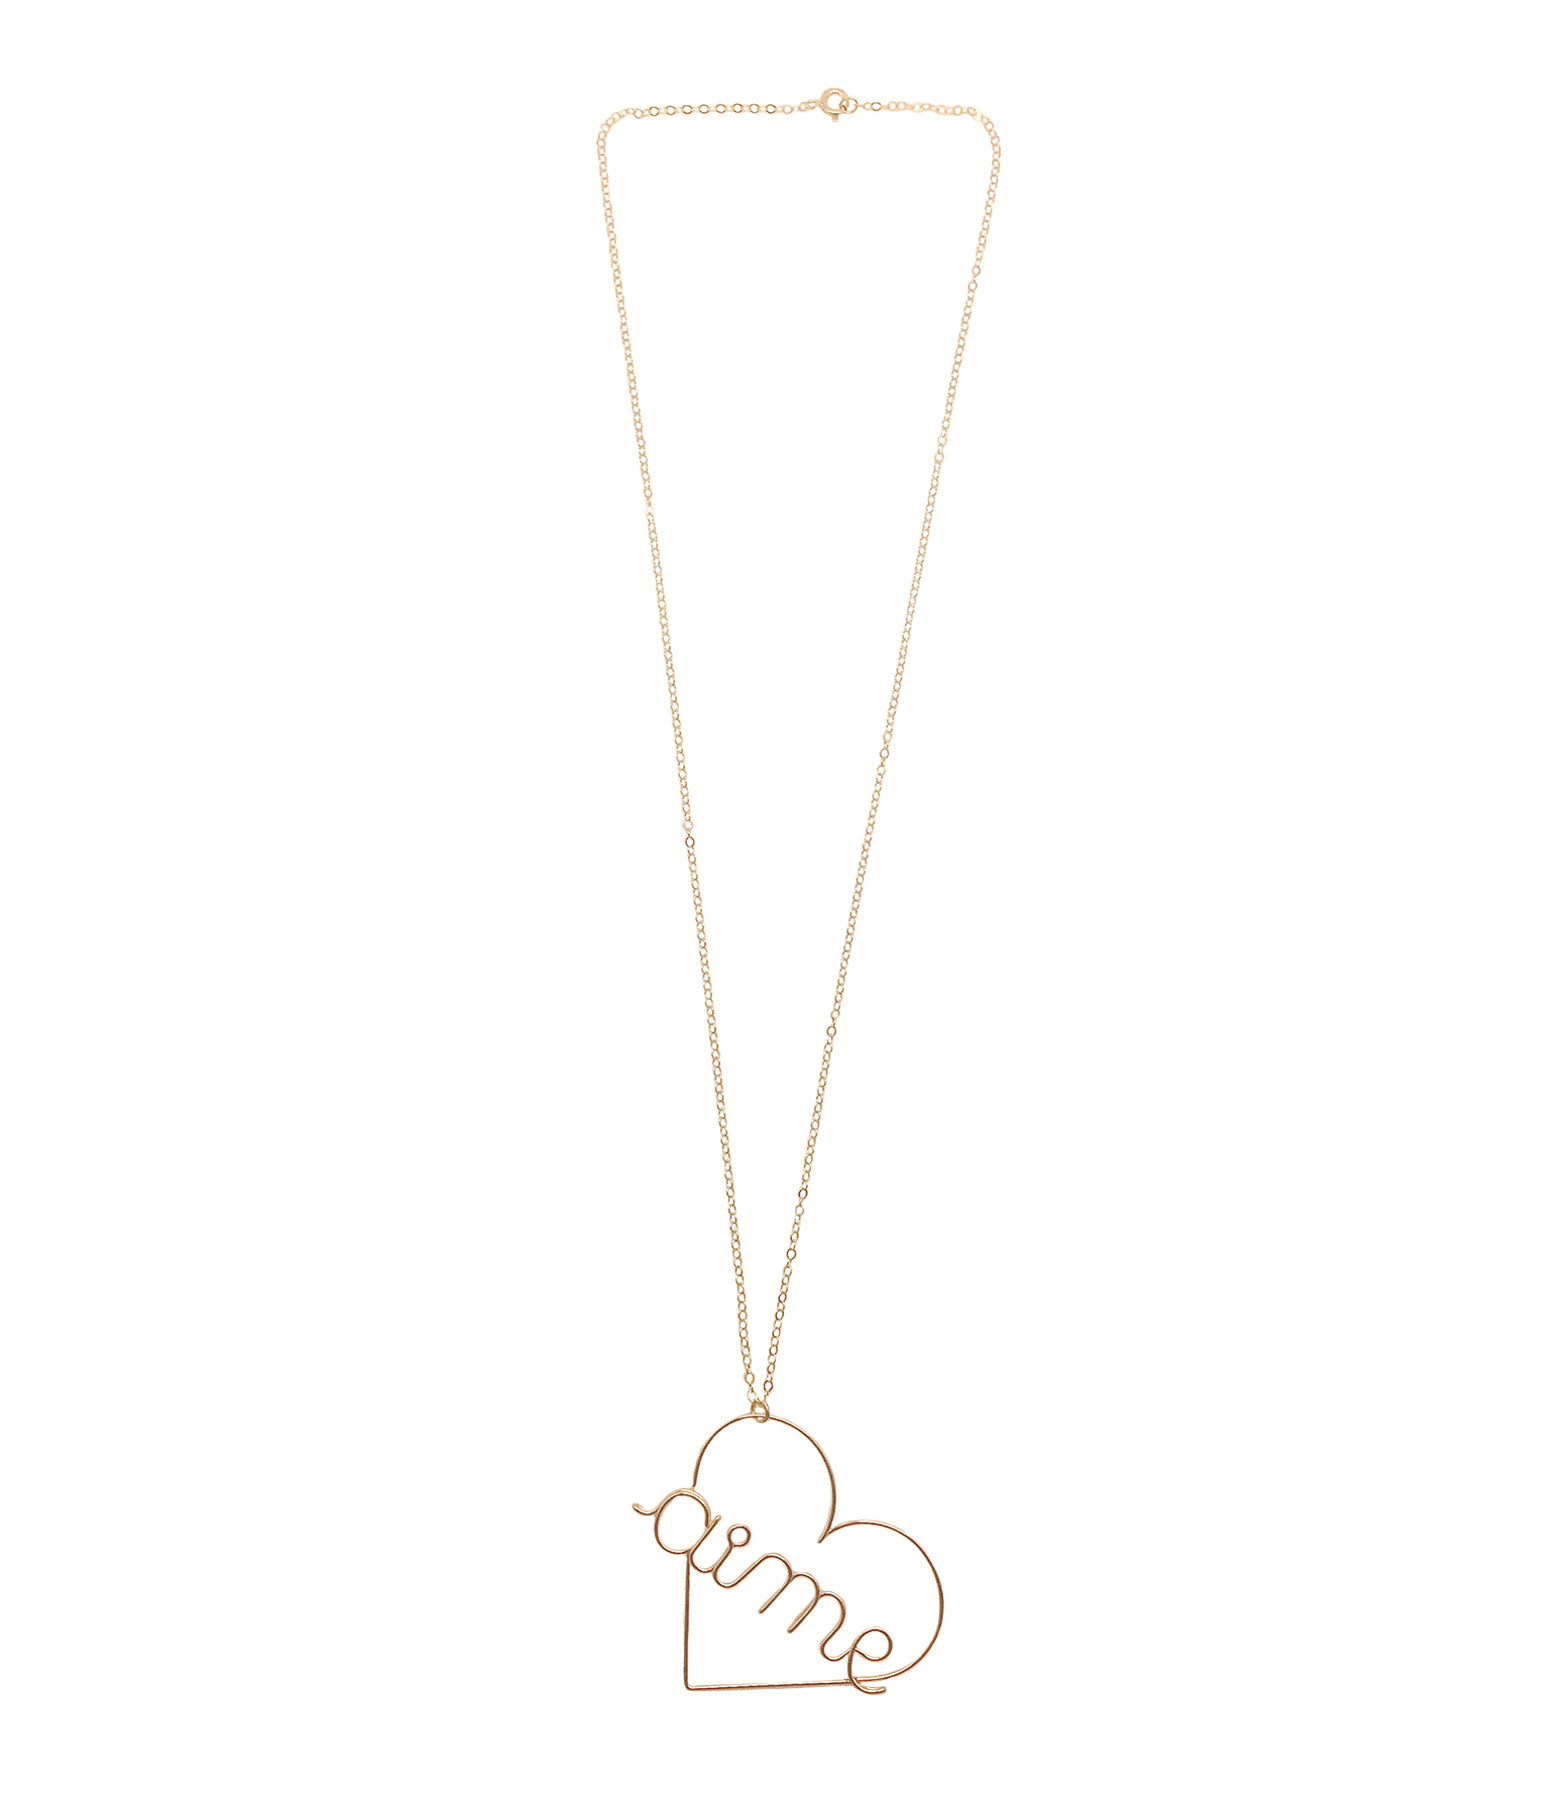 ATELIER PAULIN - Collier Aime GM Gold Filled 14K, Atelier Paulin x Inside Closet